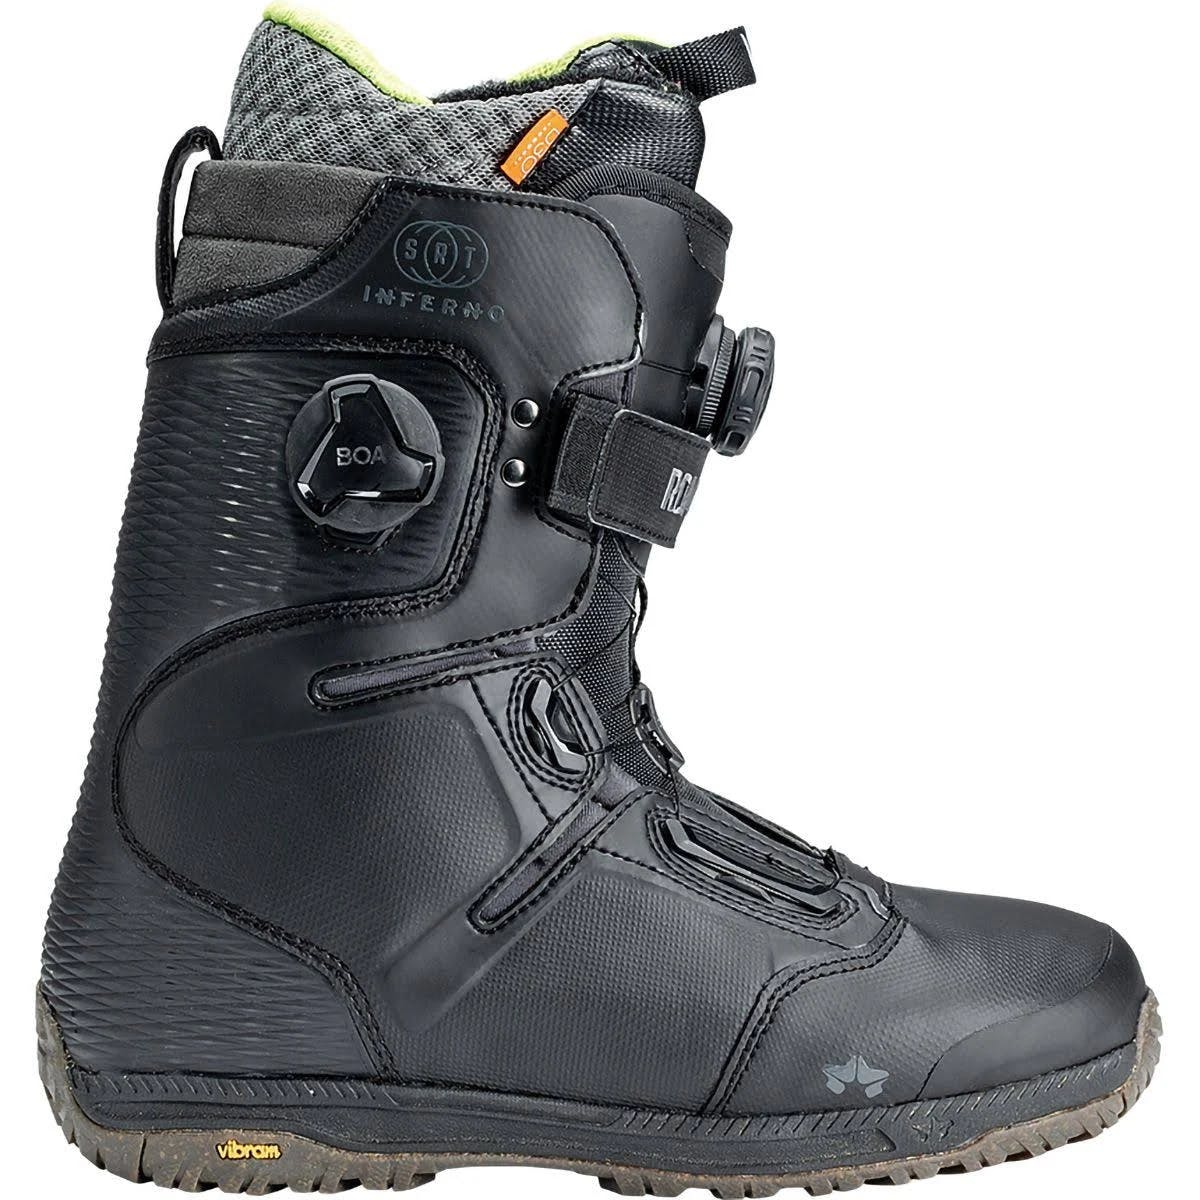 Rome Inferno Srt Snowboard Boots Men's Black 11.5